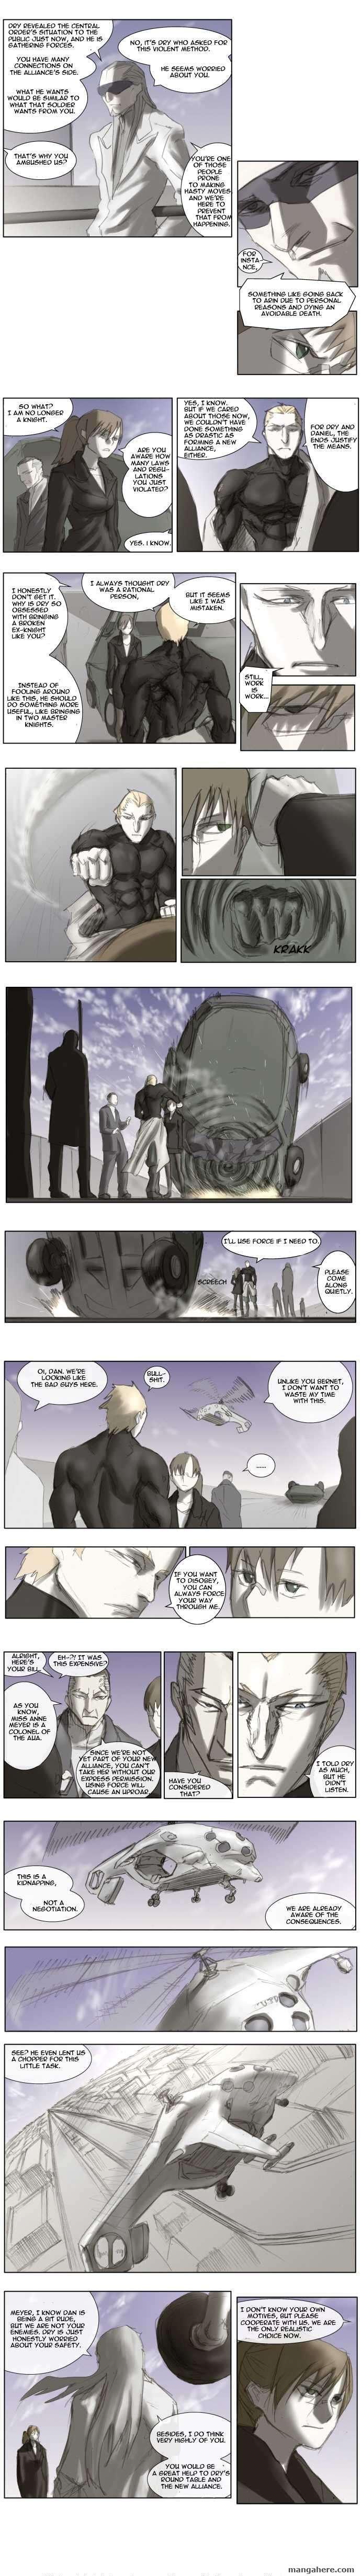 Knight Run 16 Page 2